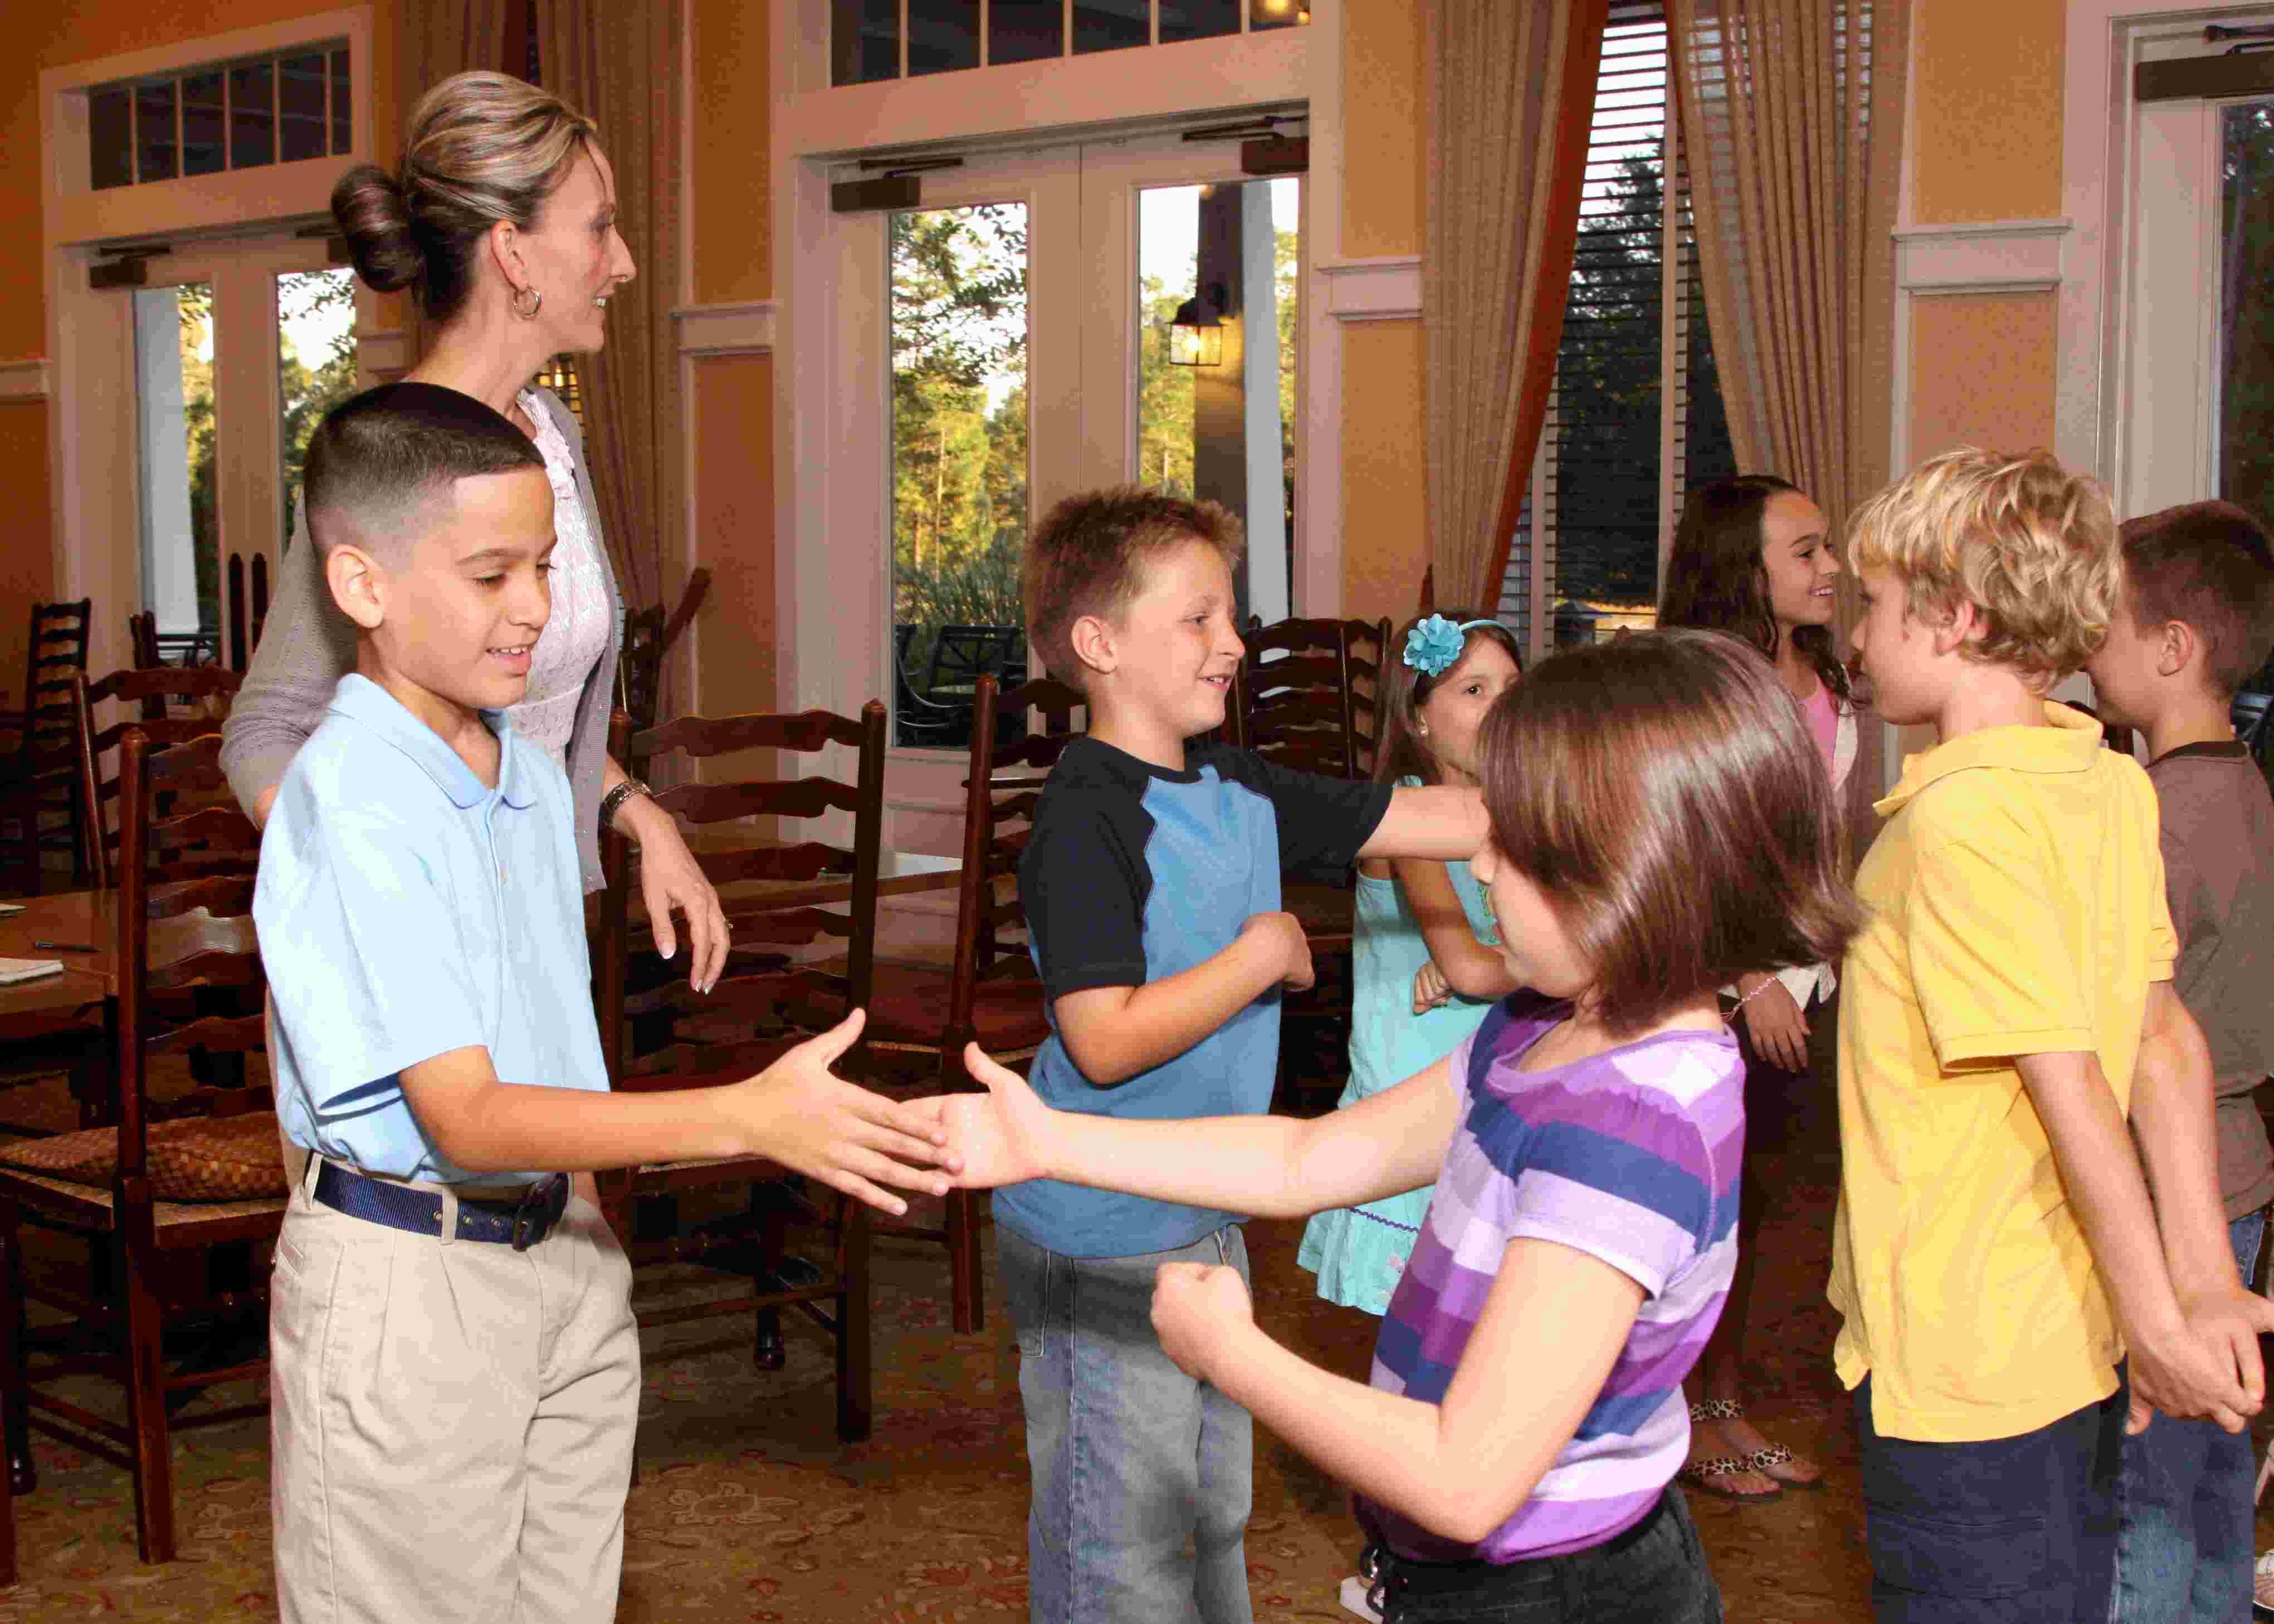 children etiquette deland 006